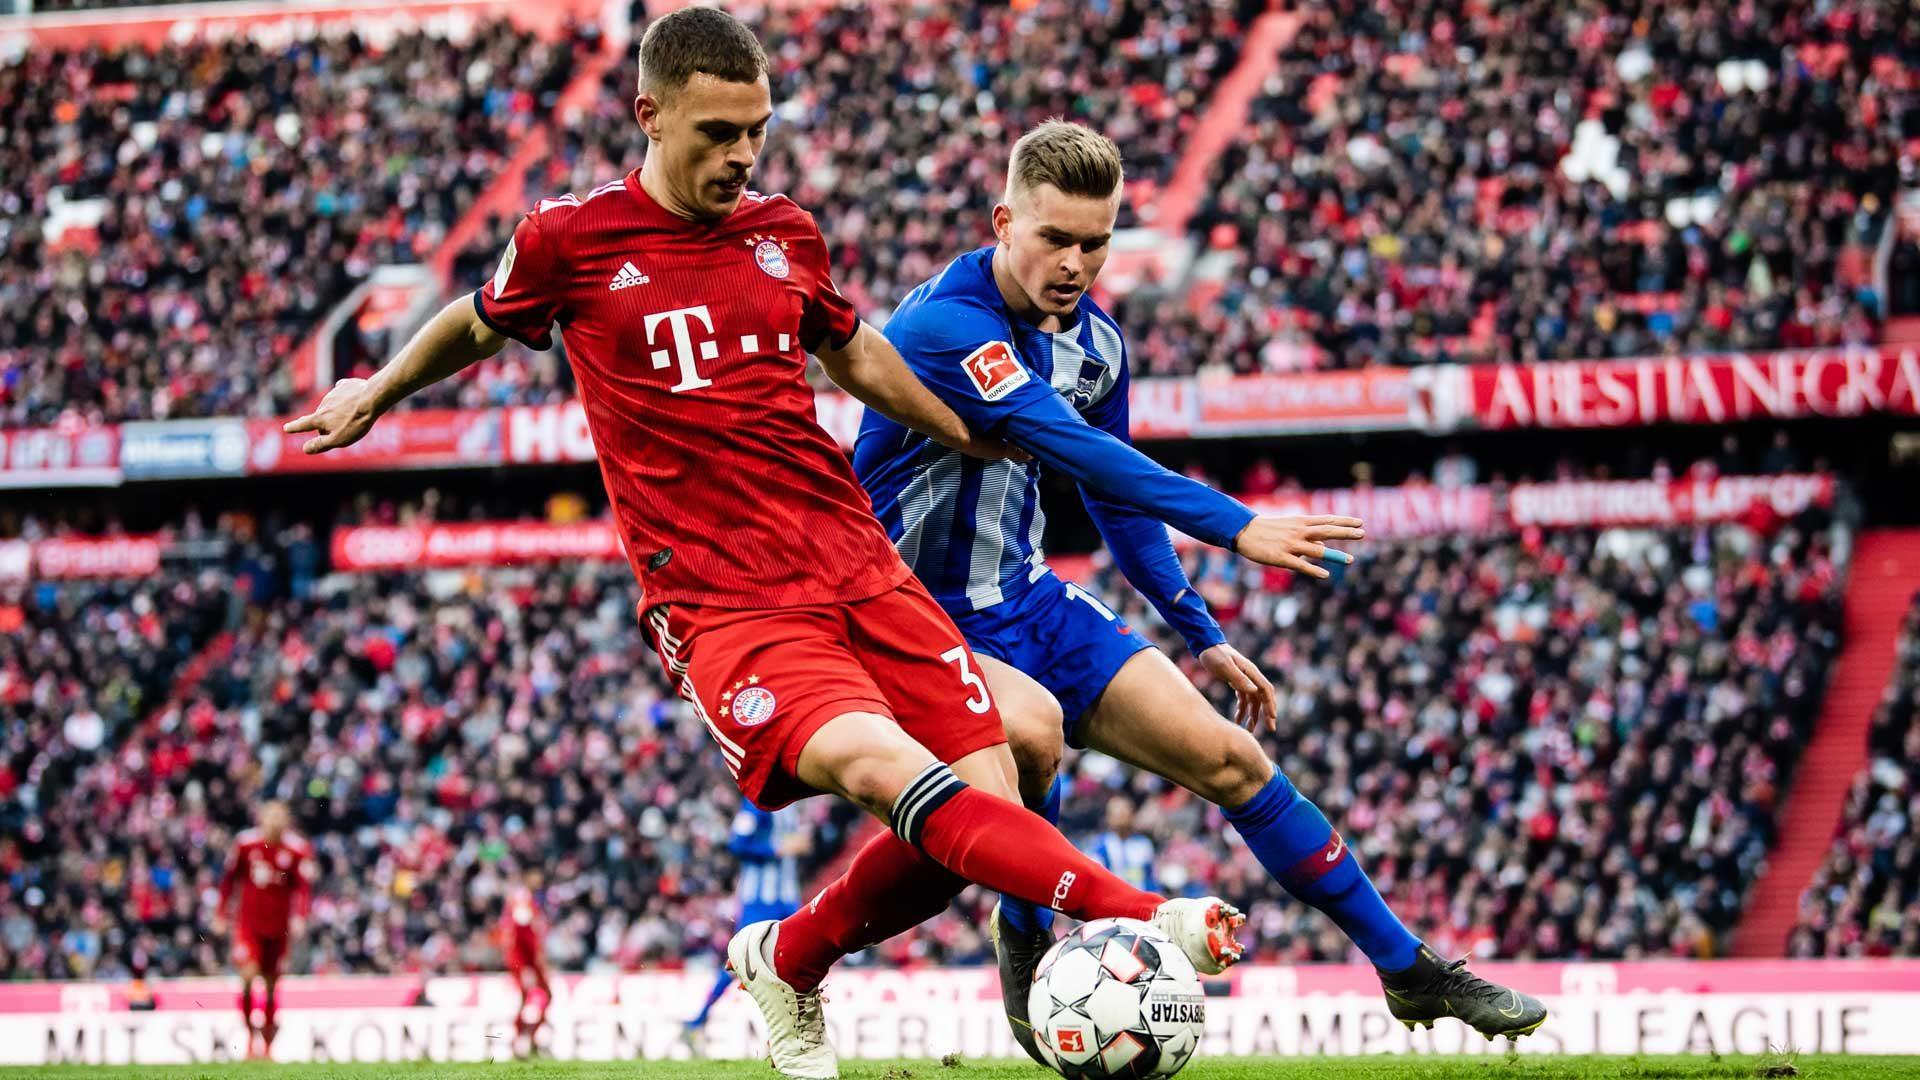 Bayern Munich vs. Hertha Berlin: 5 battles that could decide the 2019/20 Bundesliga season opener